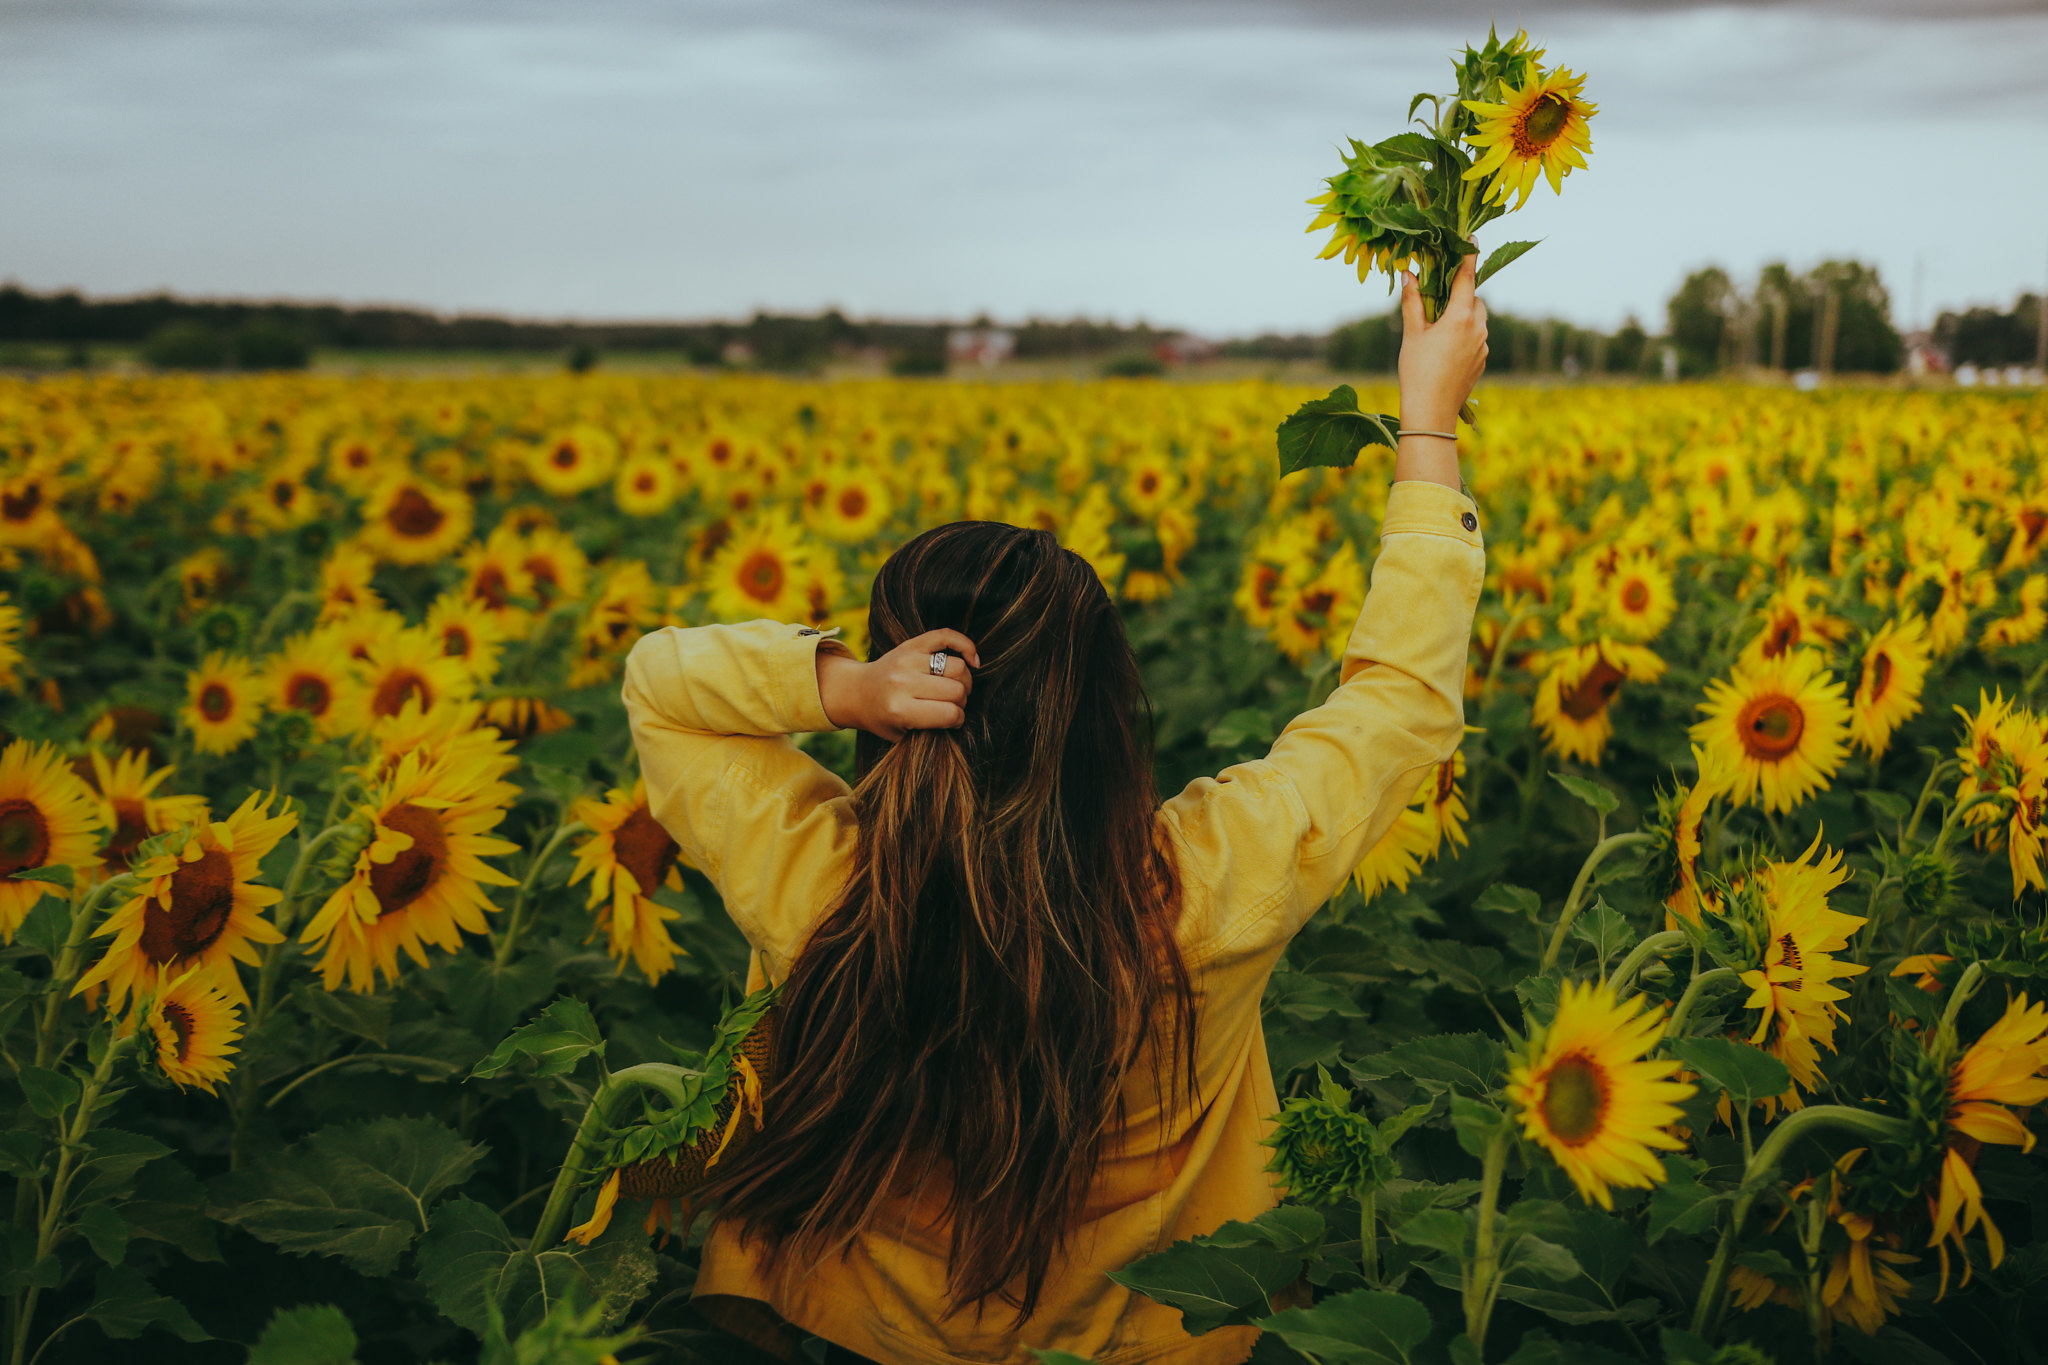 auringonkukkia-32